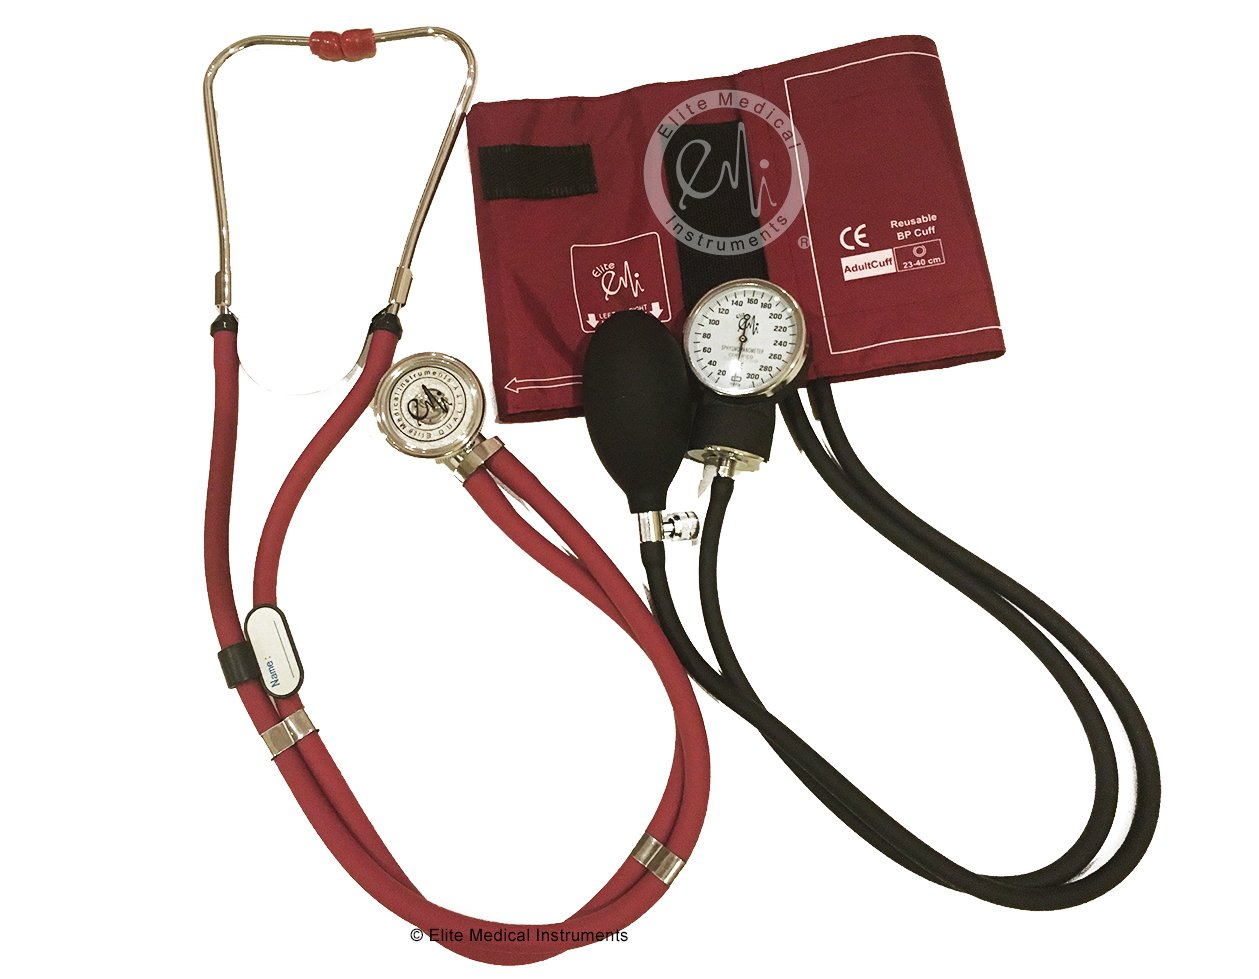 EMI BURGUNDY 330 Sprague Rappaport Stethoscope and Aneroid Sphygmomanometer Blood Pressure Set Kit